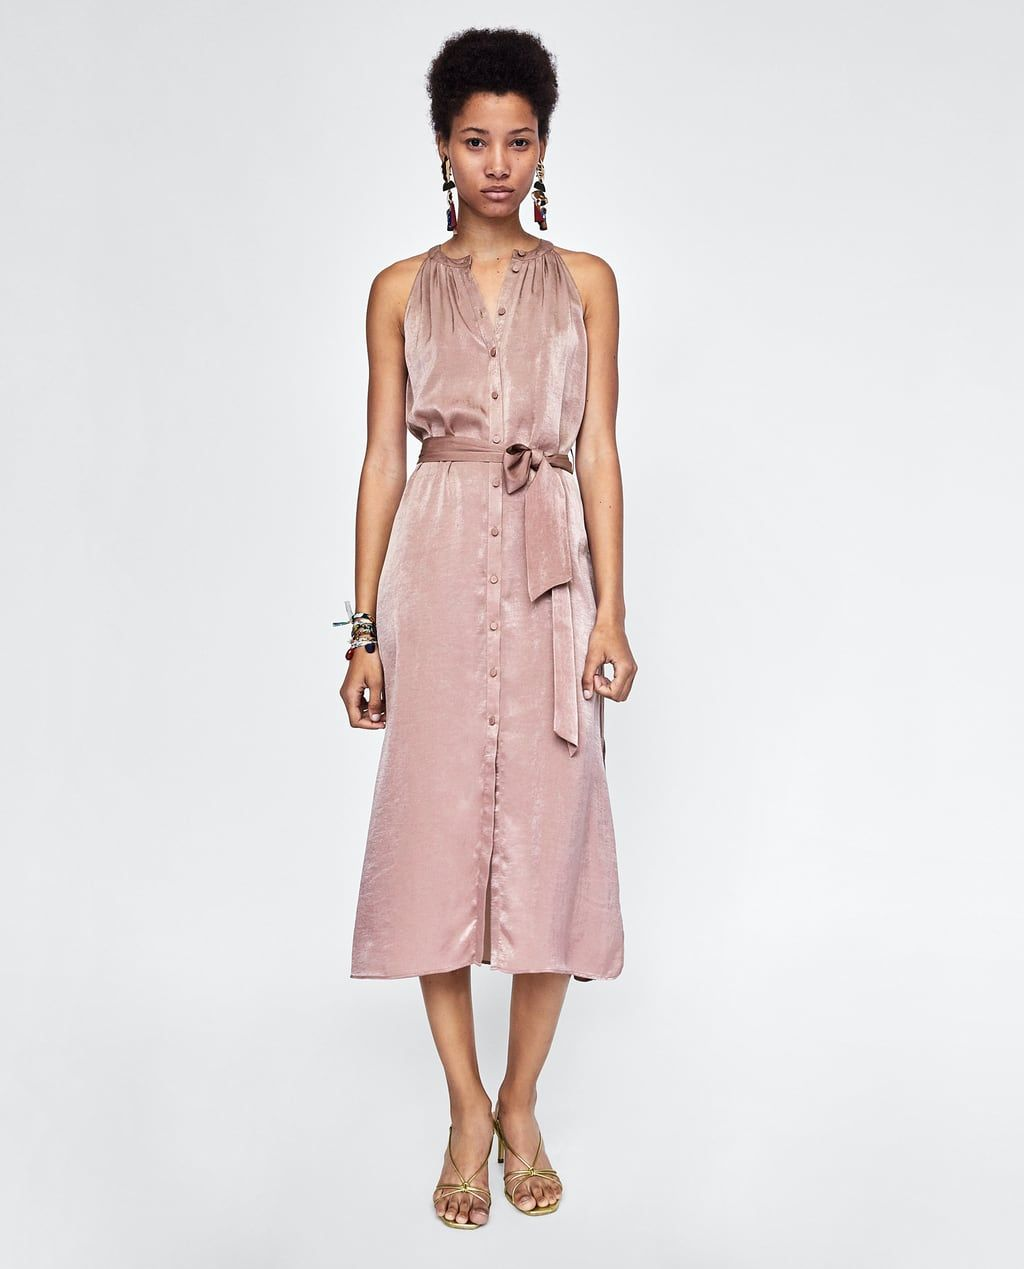 VESTIDO SATINADO | zara в 2019 г. | Модные стили, Мода 70 ...